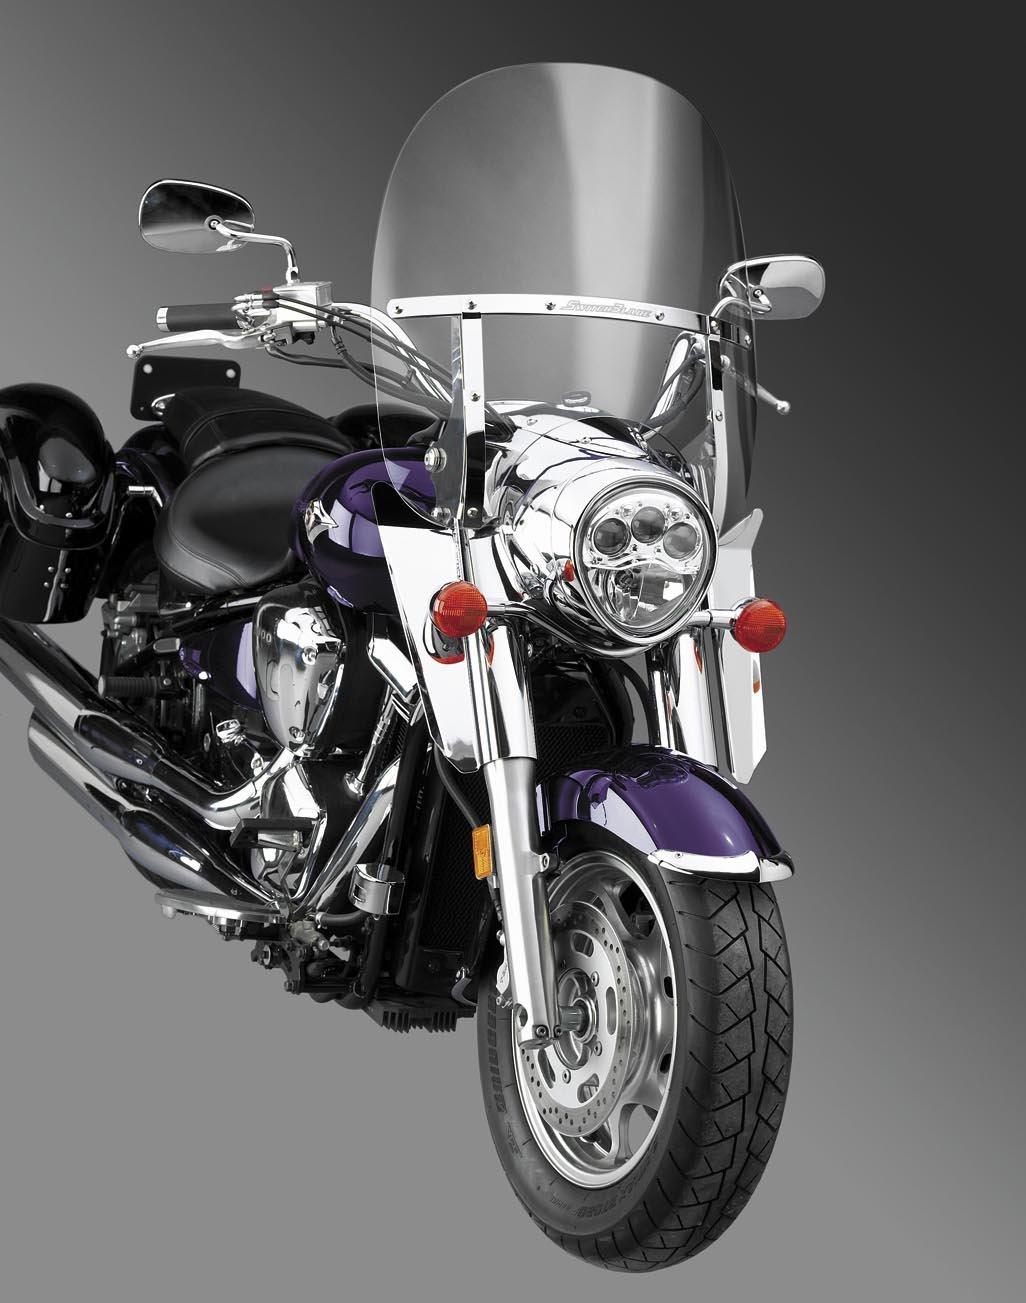 Kawasaki Vulcan 1600 Classic Switchblade 2UP Windshield National Cycle